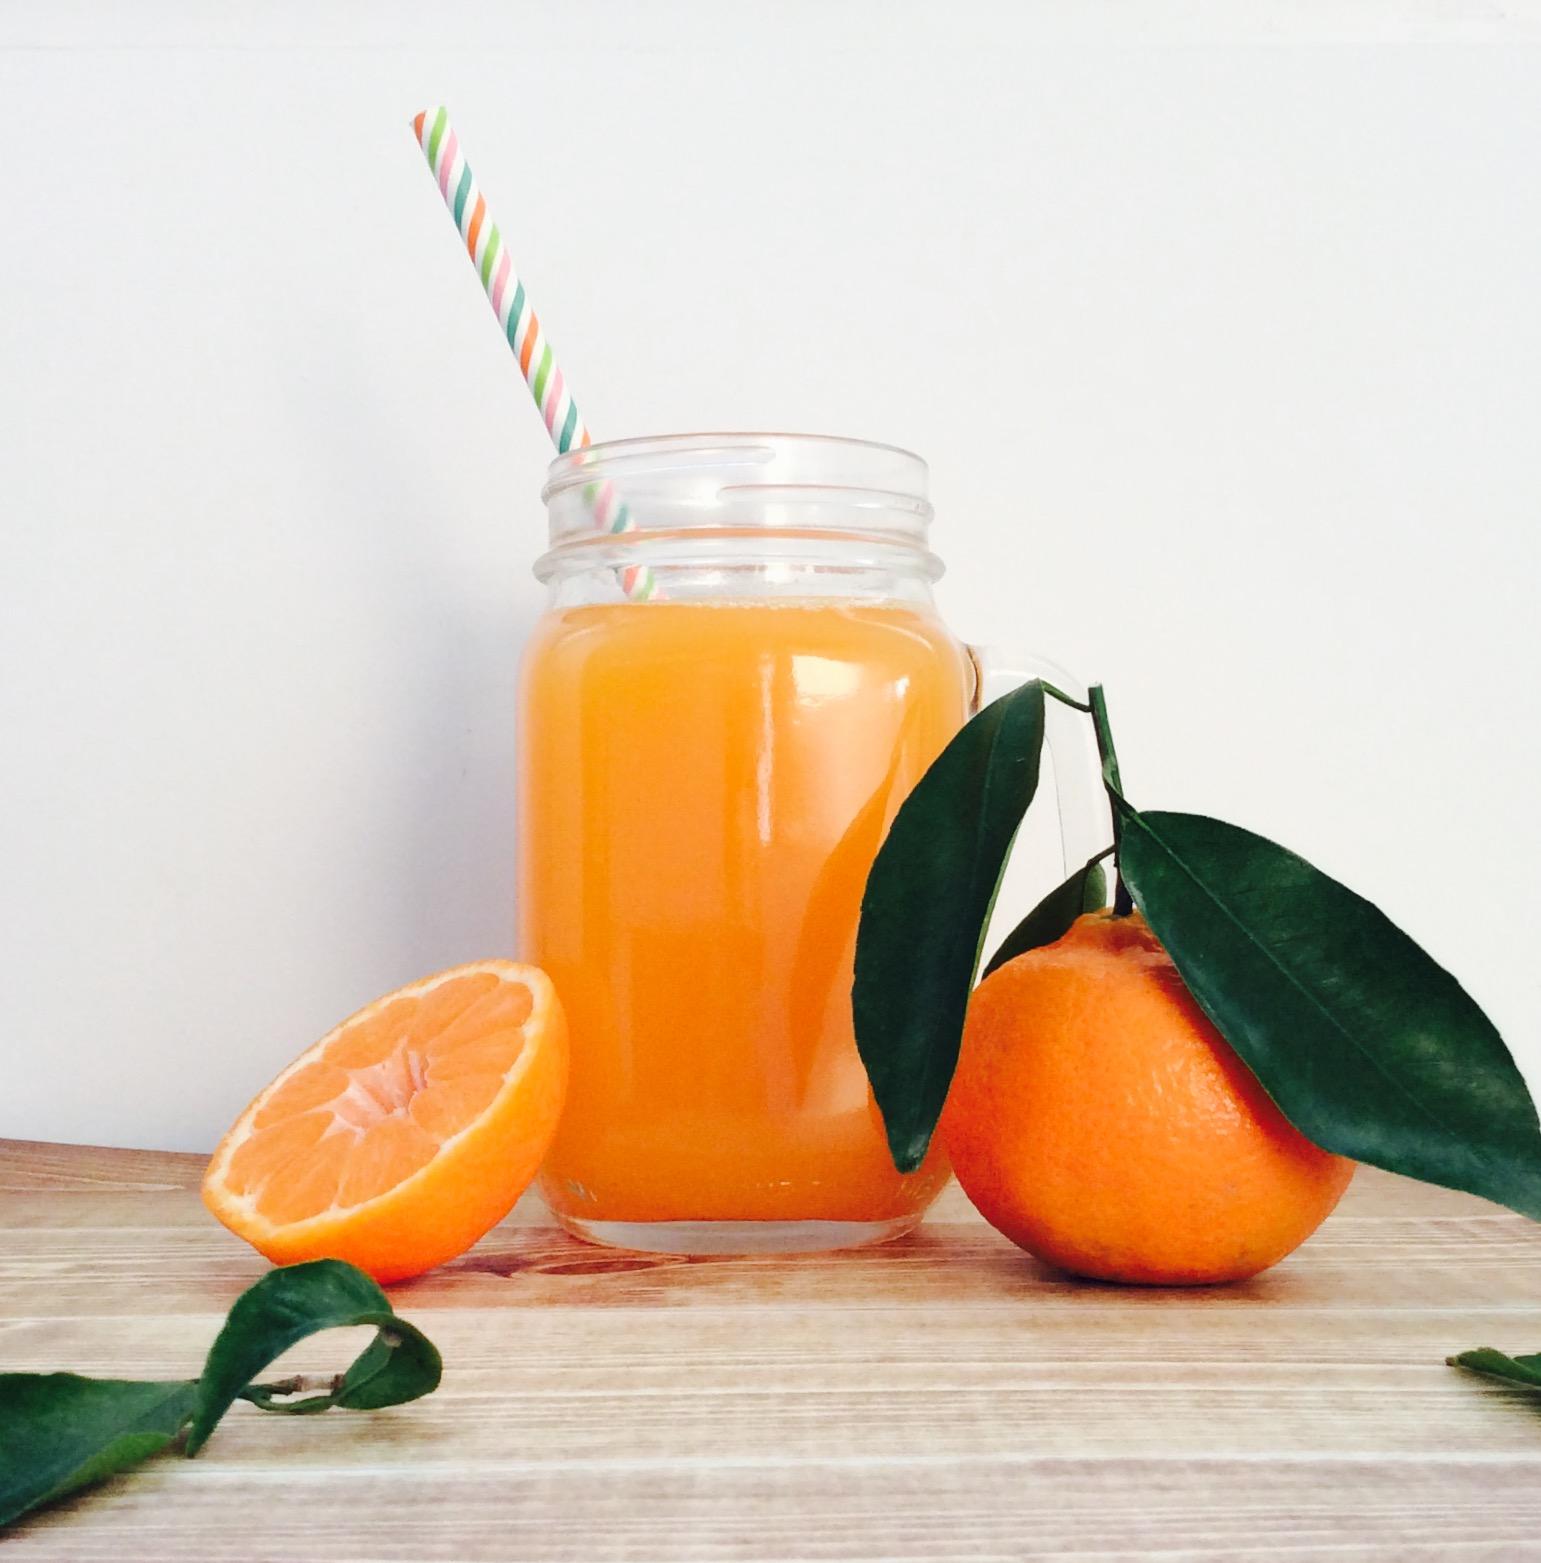 receta-zumo-mandarina y mango-ido-1